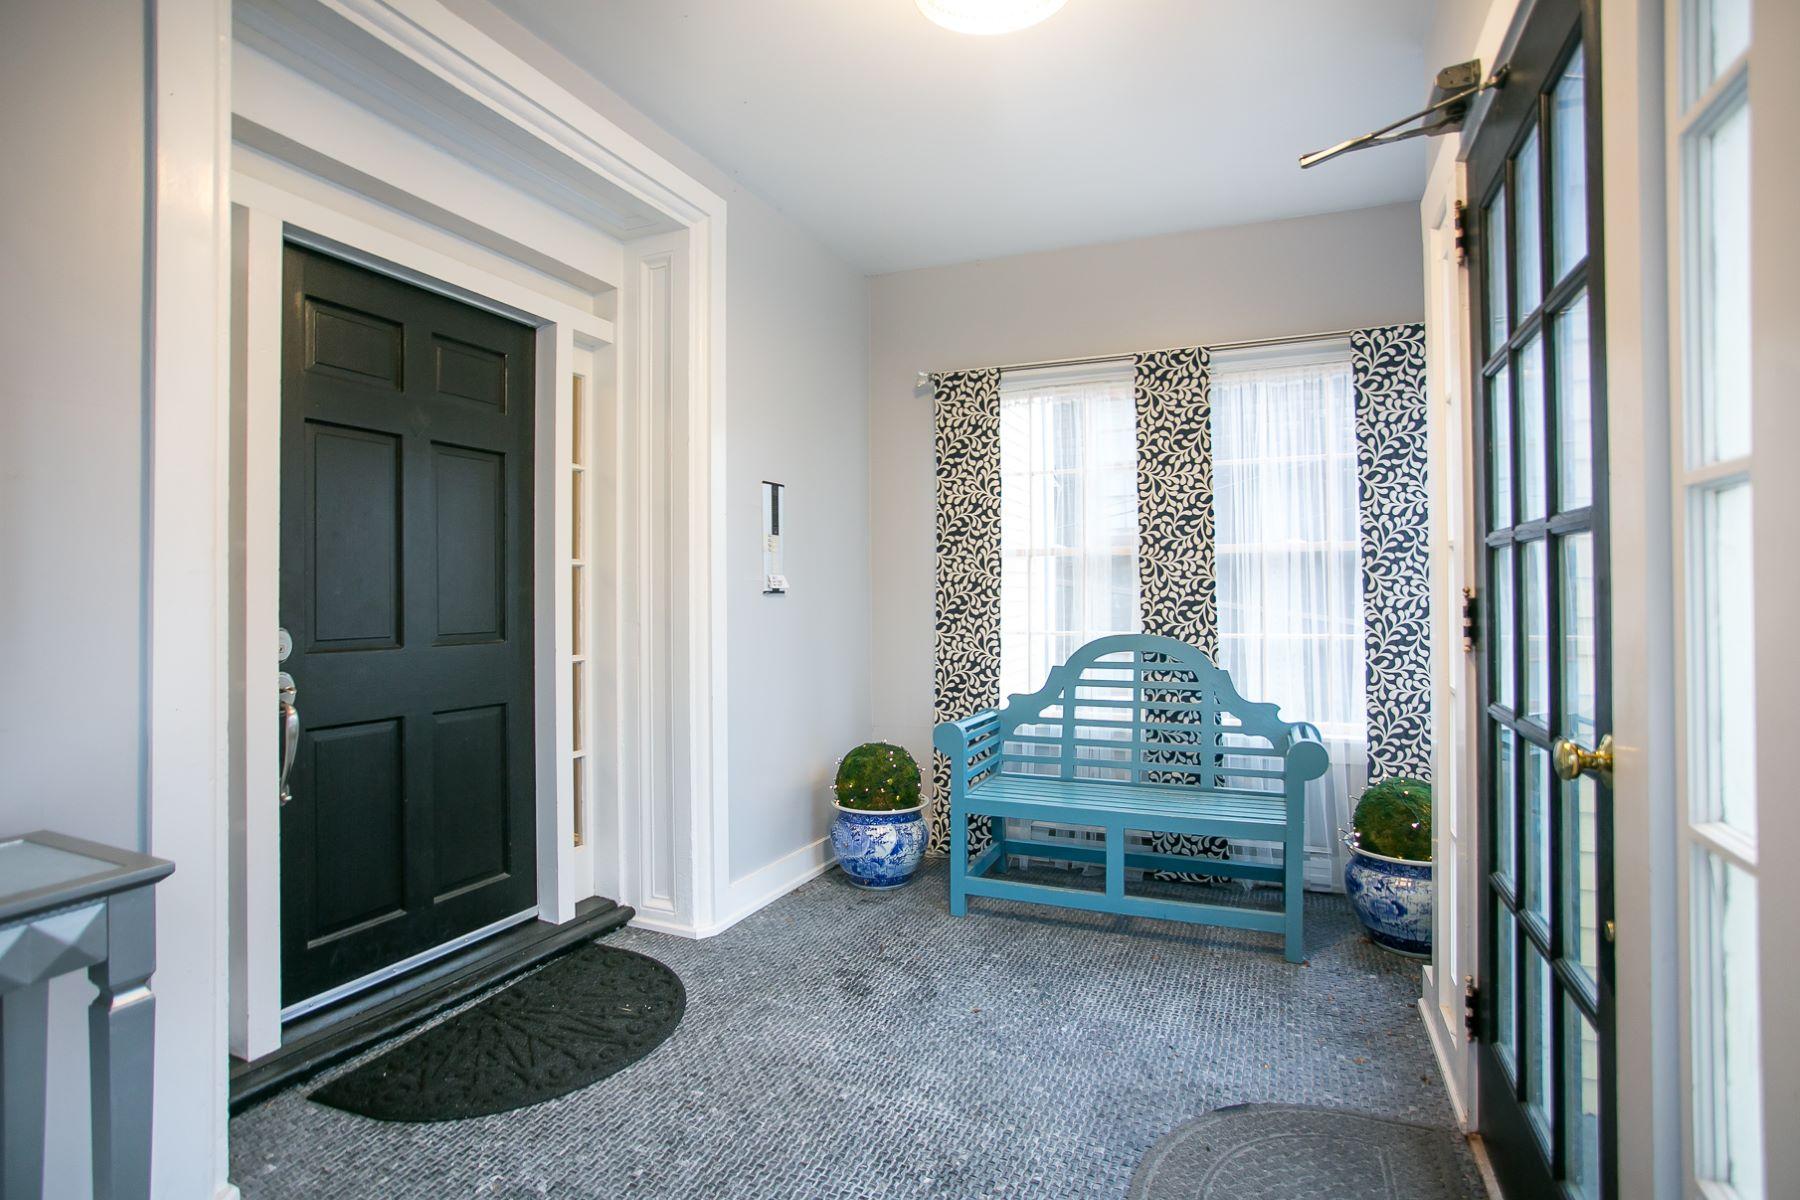 Condominiums for Sale at Pelham Street Condo 75 Pelham Street B Newport, Rhode Island 02840 United States